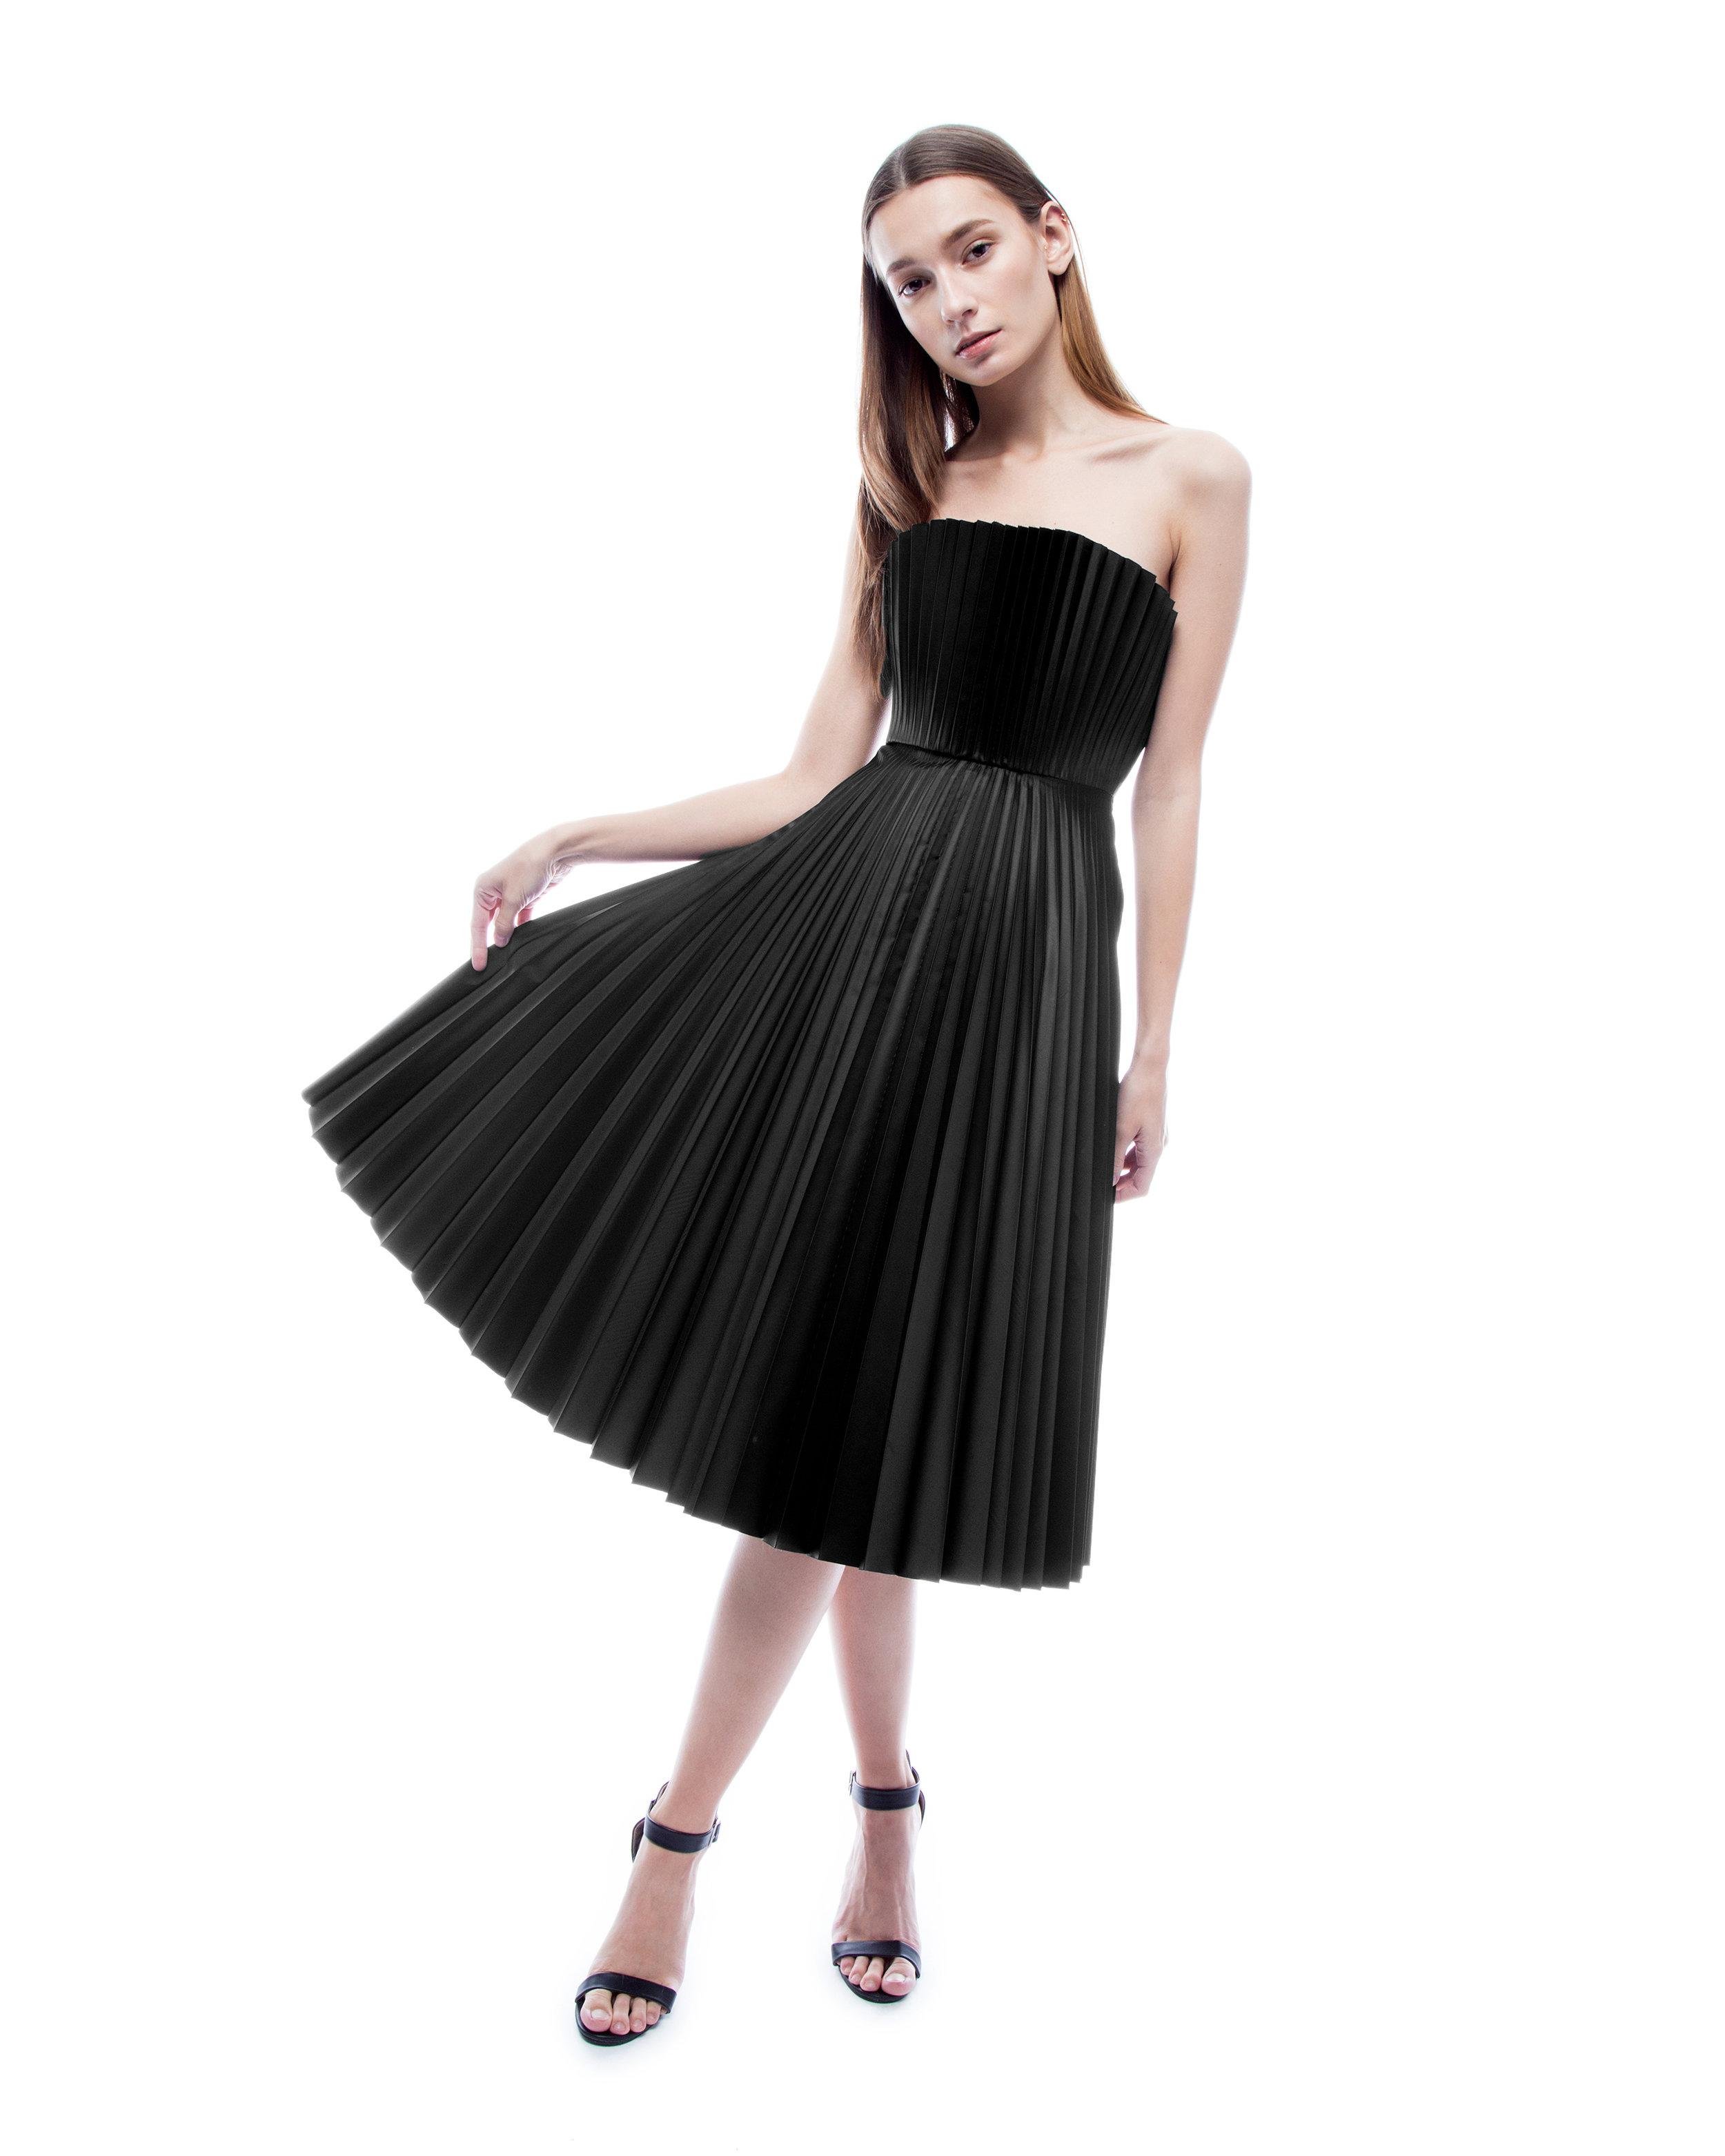 01-olya-kosterina-black-pleated-dress.jpg